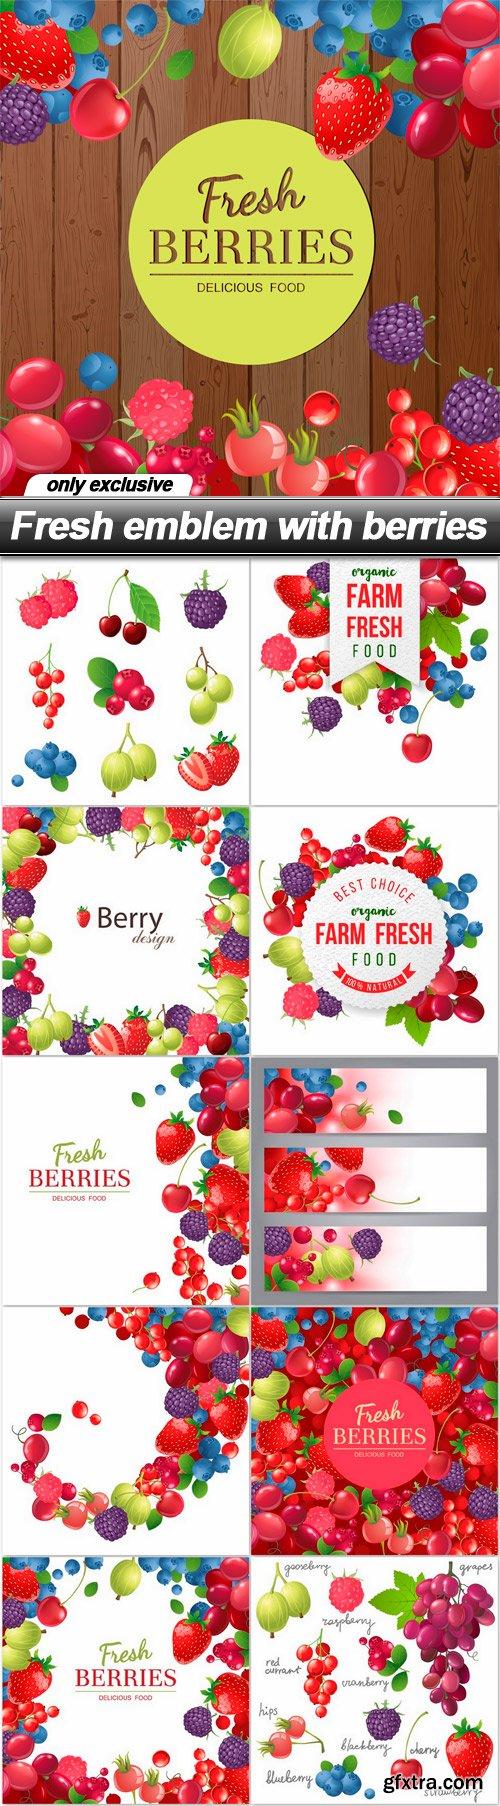 Fresh emblem with berries - 11 EPS